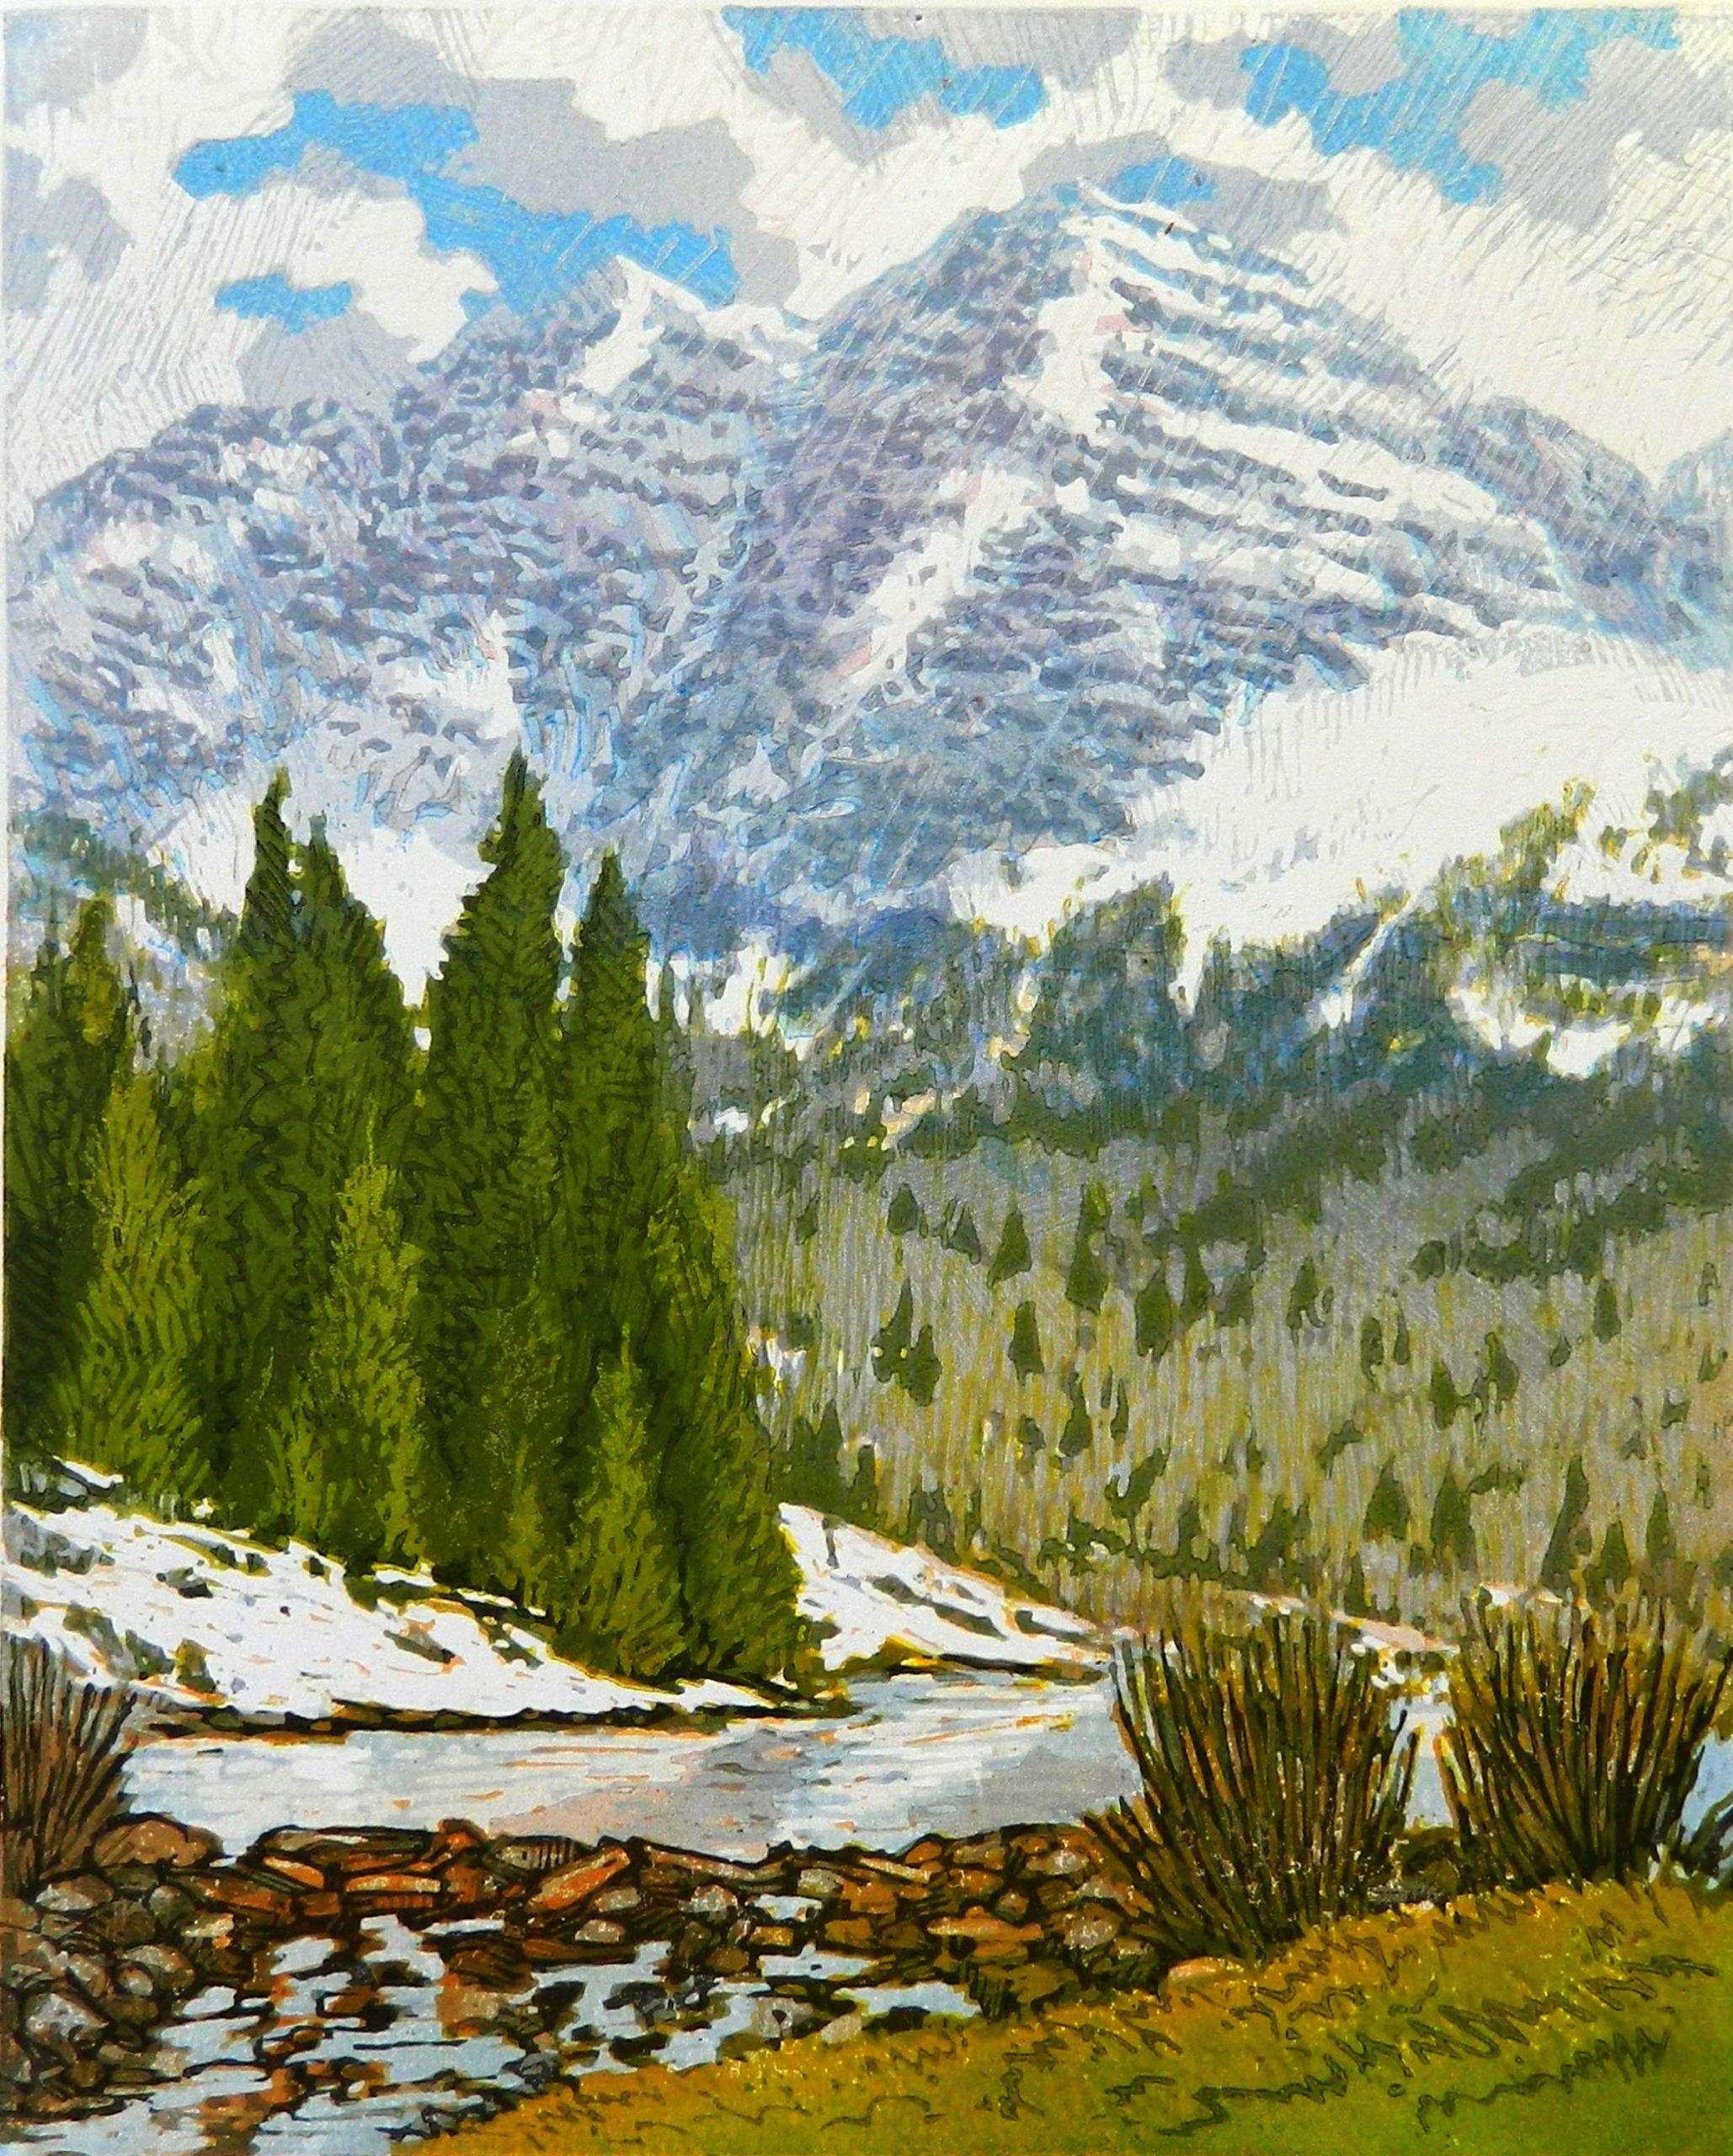 Leon Loughridge - Spring Flurries, Maroon Bells - 7/28